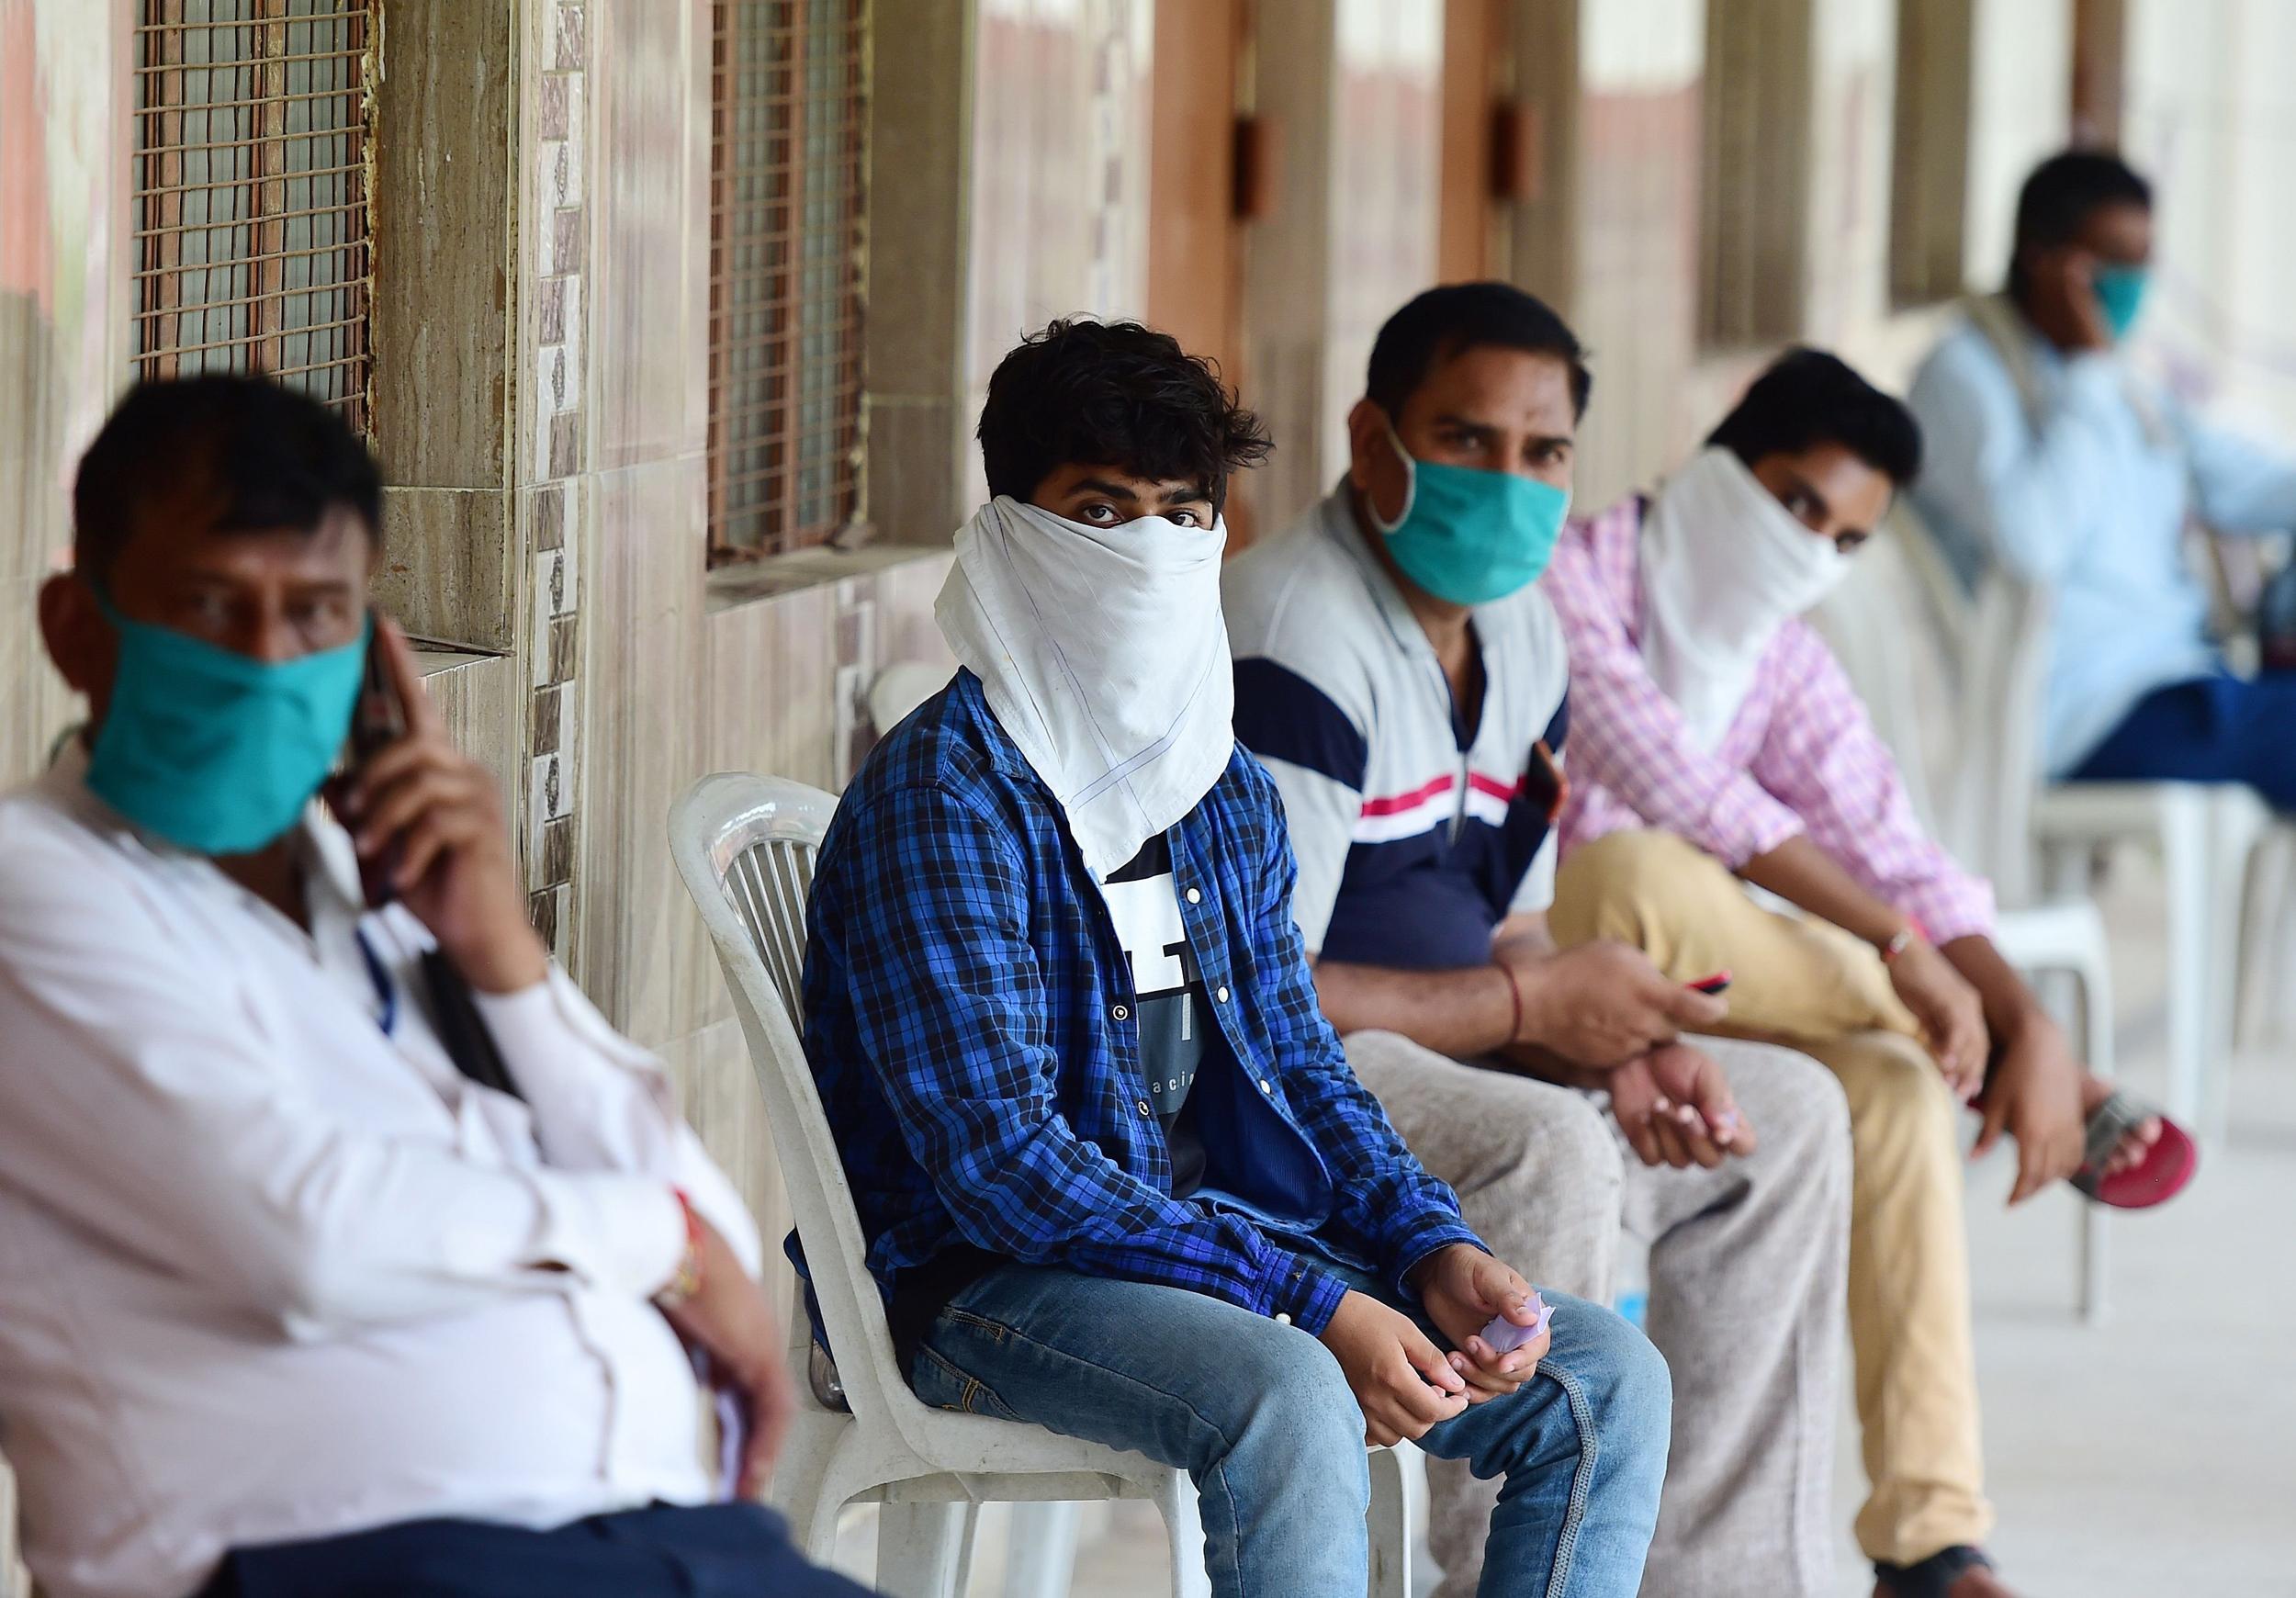 Coronavirus: India hits 2 million cases as health volunteers go on strike